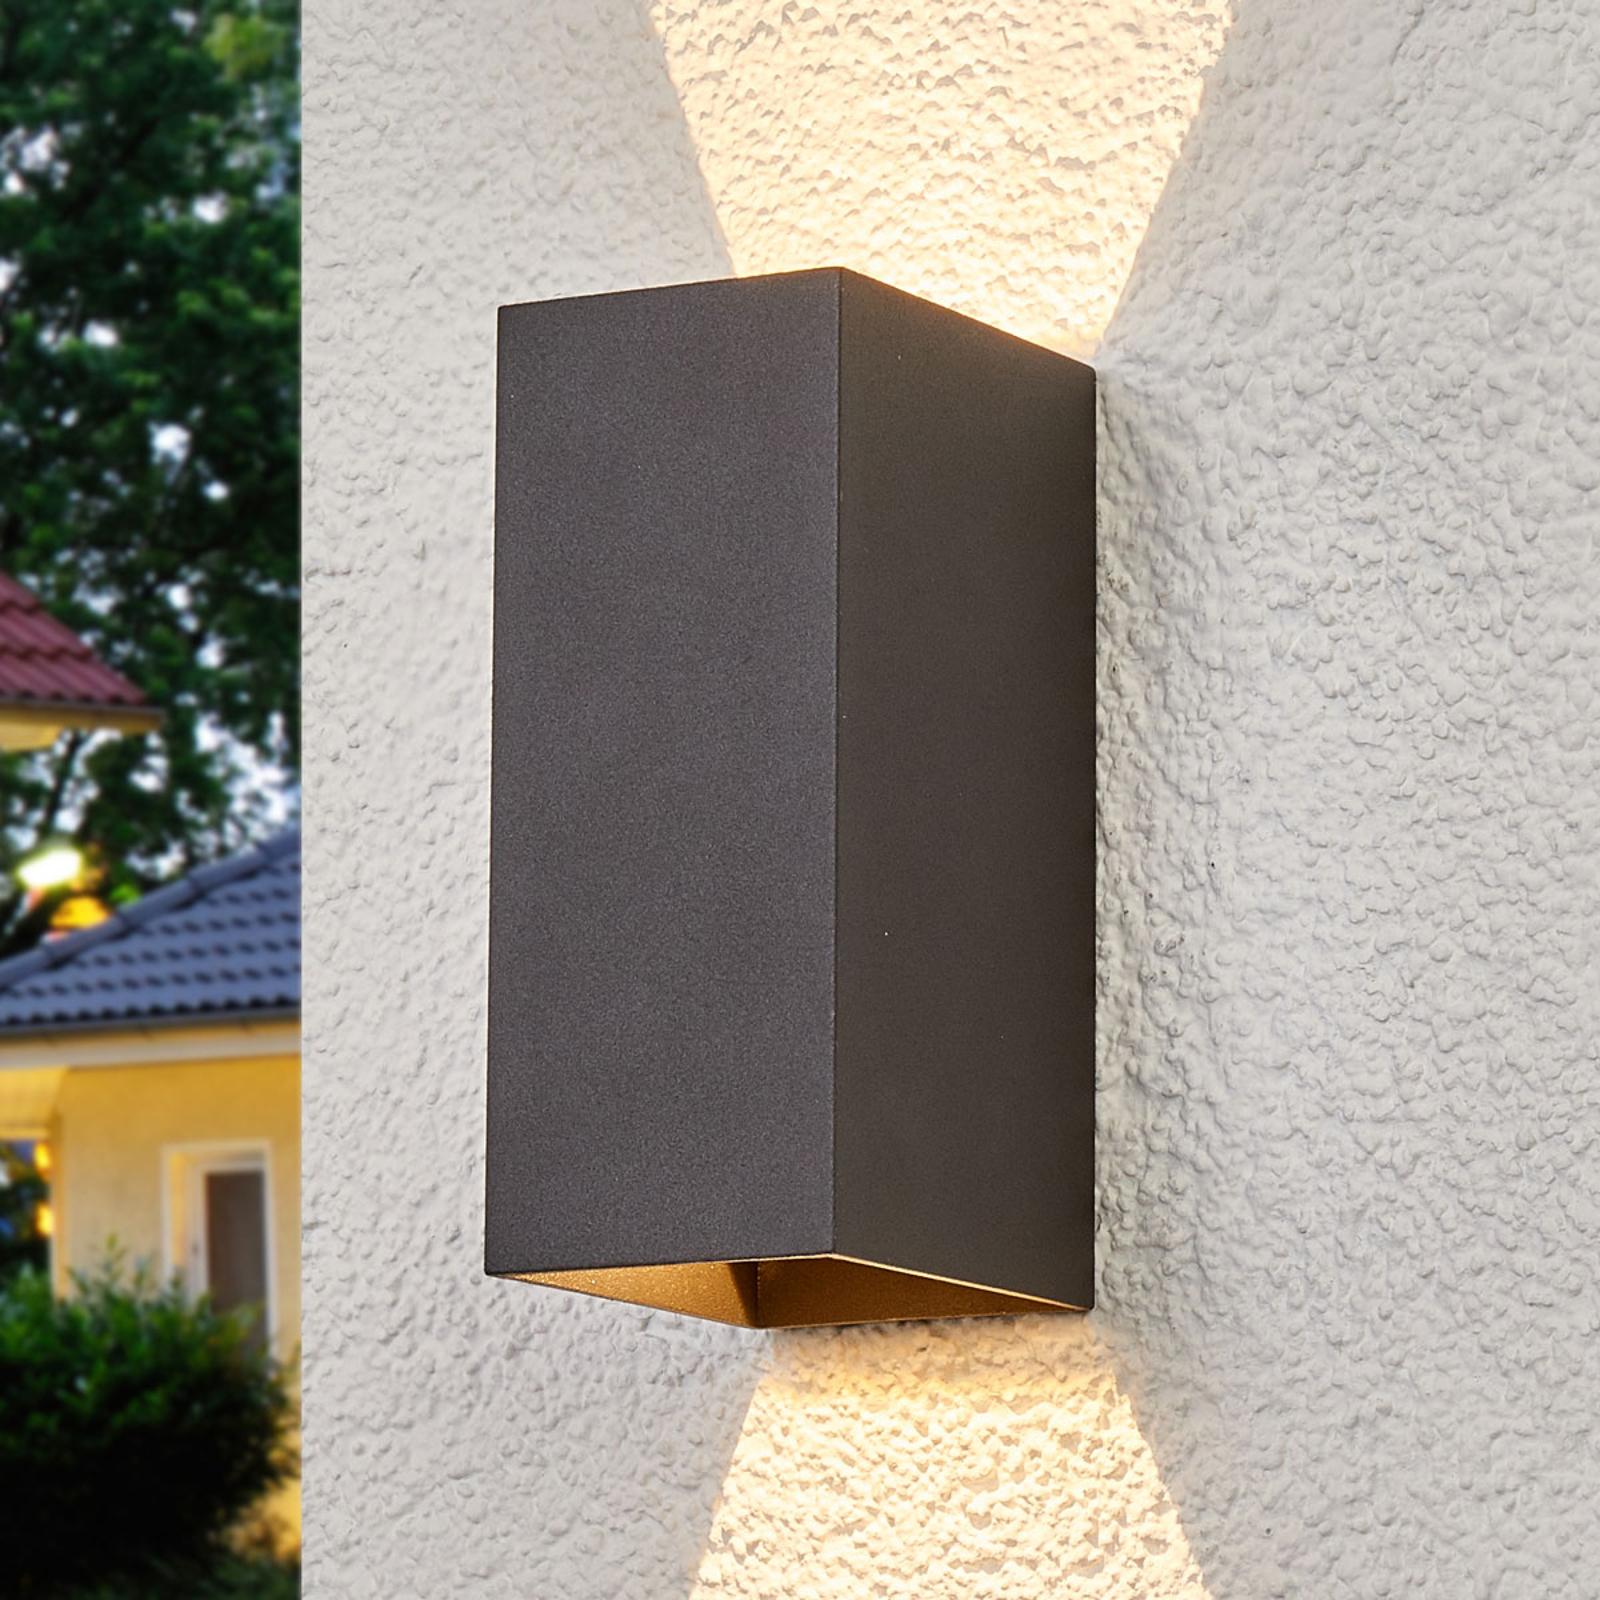 Mikka - 2-punktowa lampa zewnętrzna LED